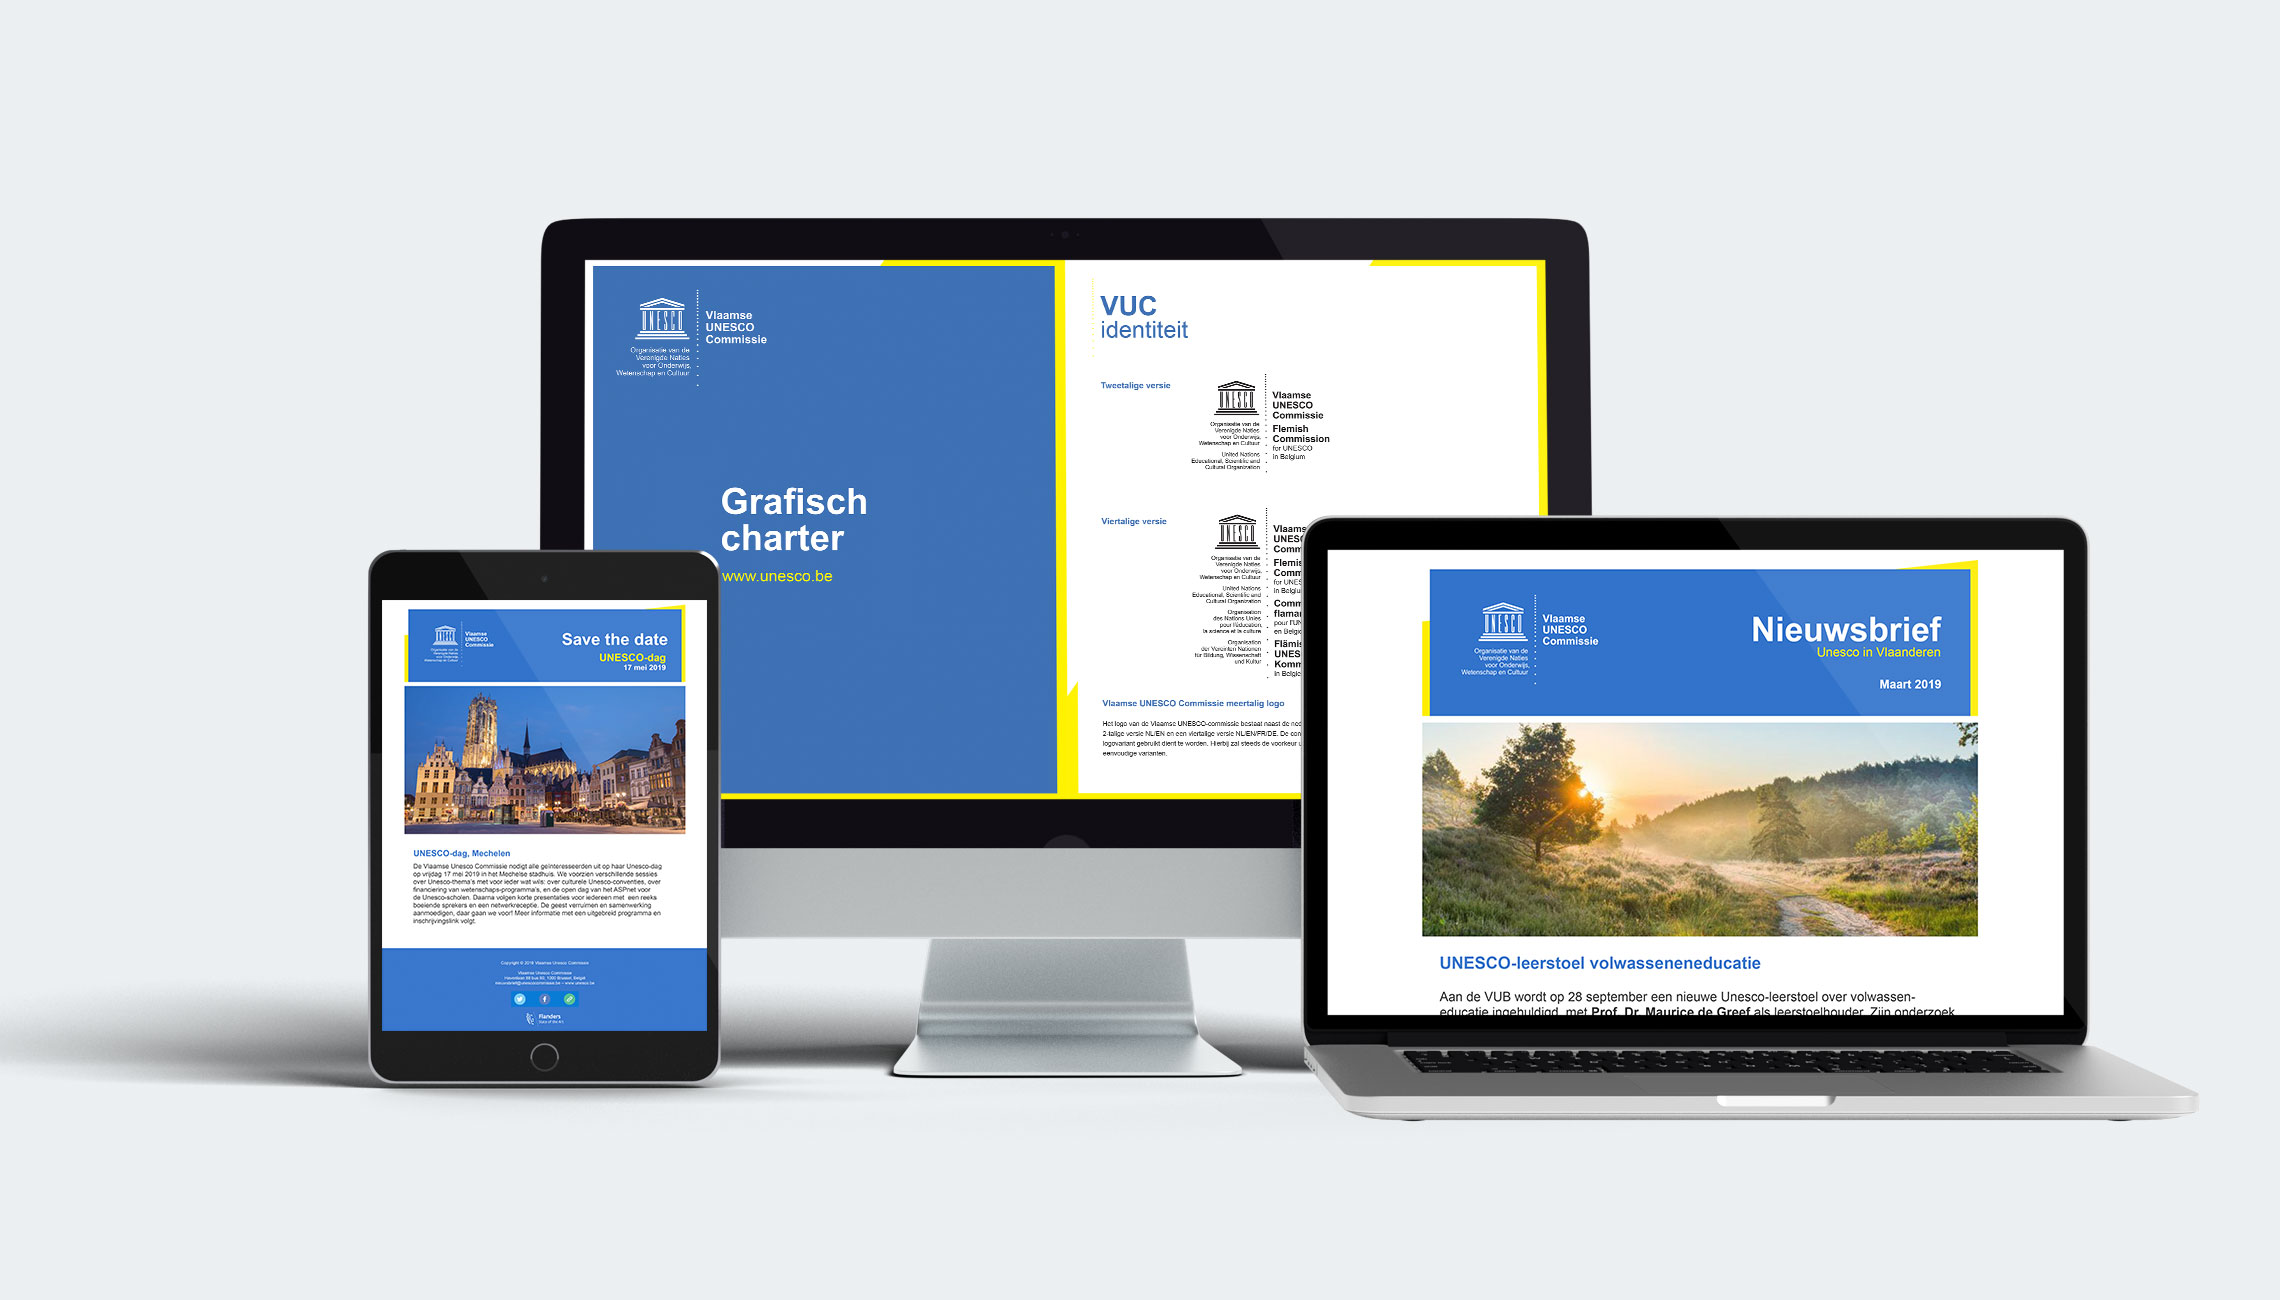 identity: Visual identity UNESCO-Flanders - image 2